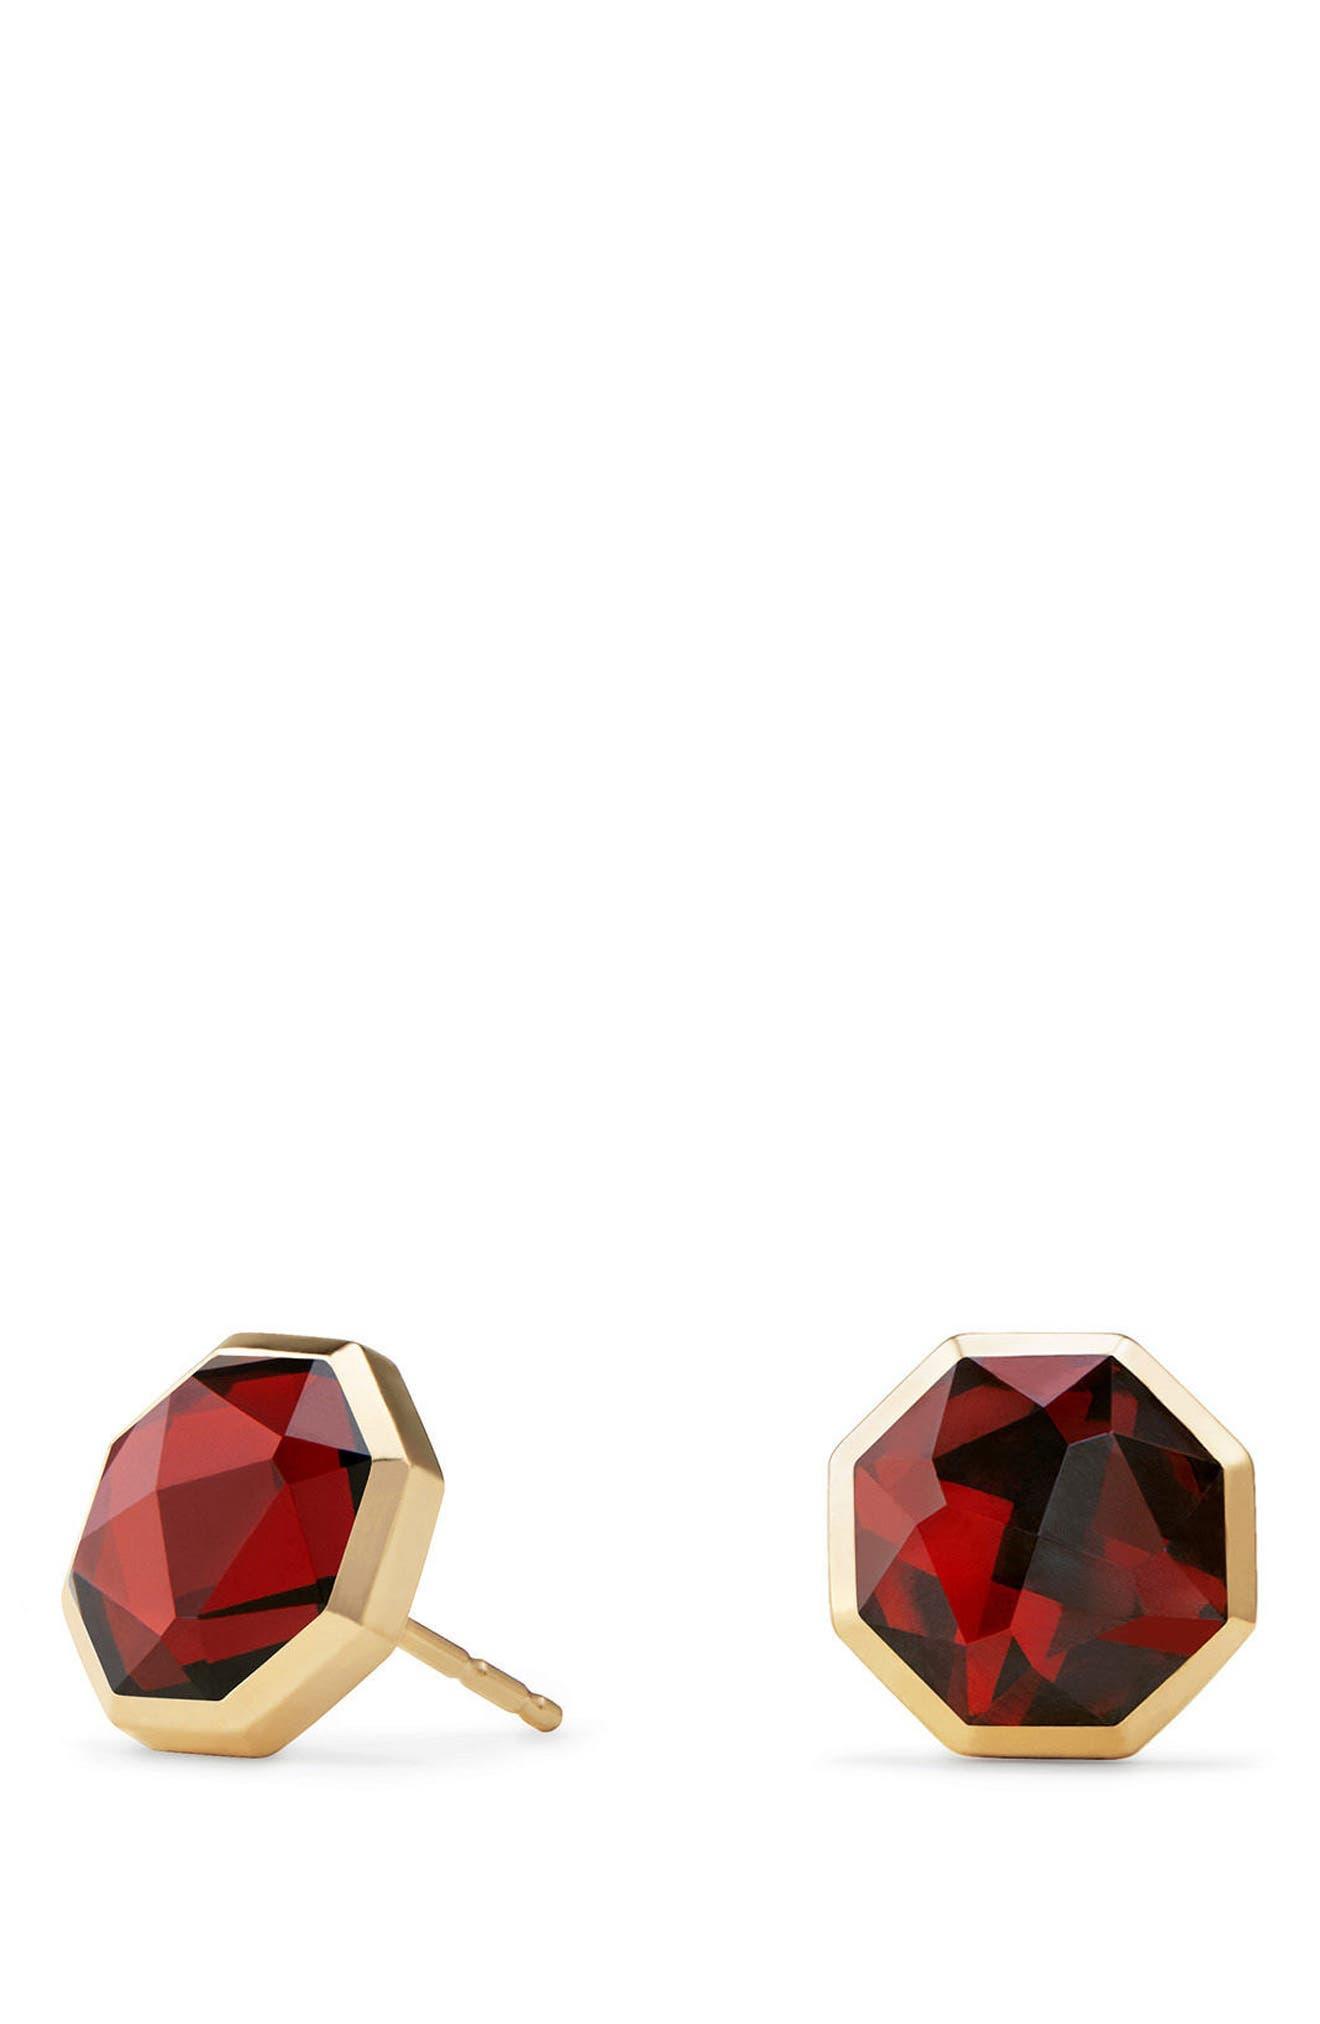 Guilin Octagon Earrings in 18K Gold,                             Main thumbnail 1, color,                             YELLOW GOLD/ GARNET